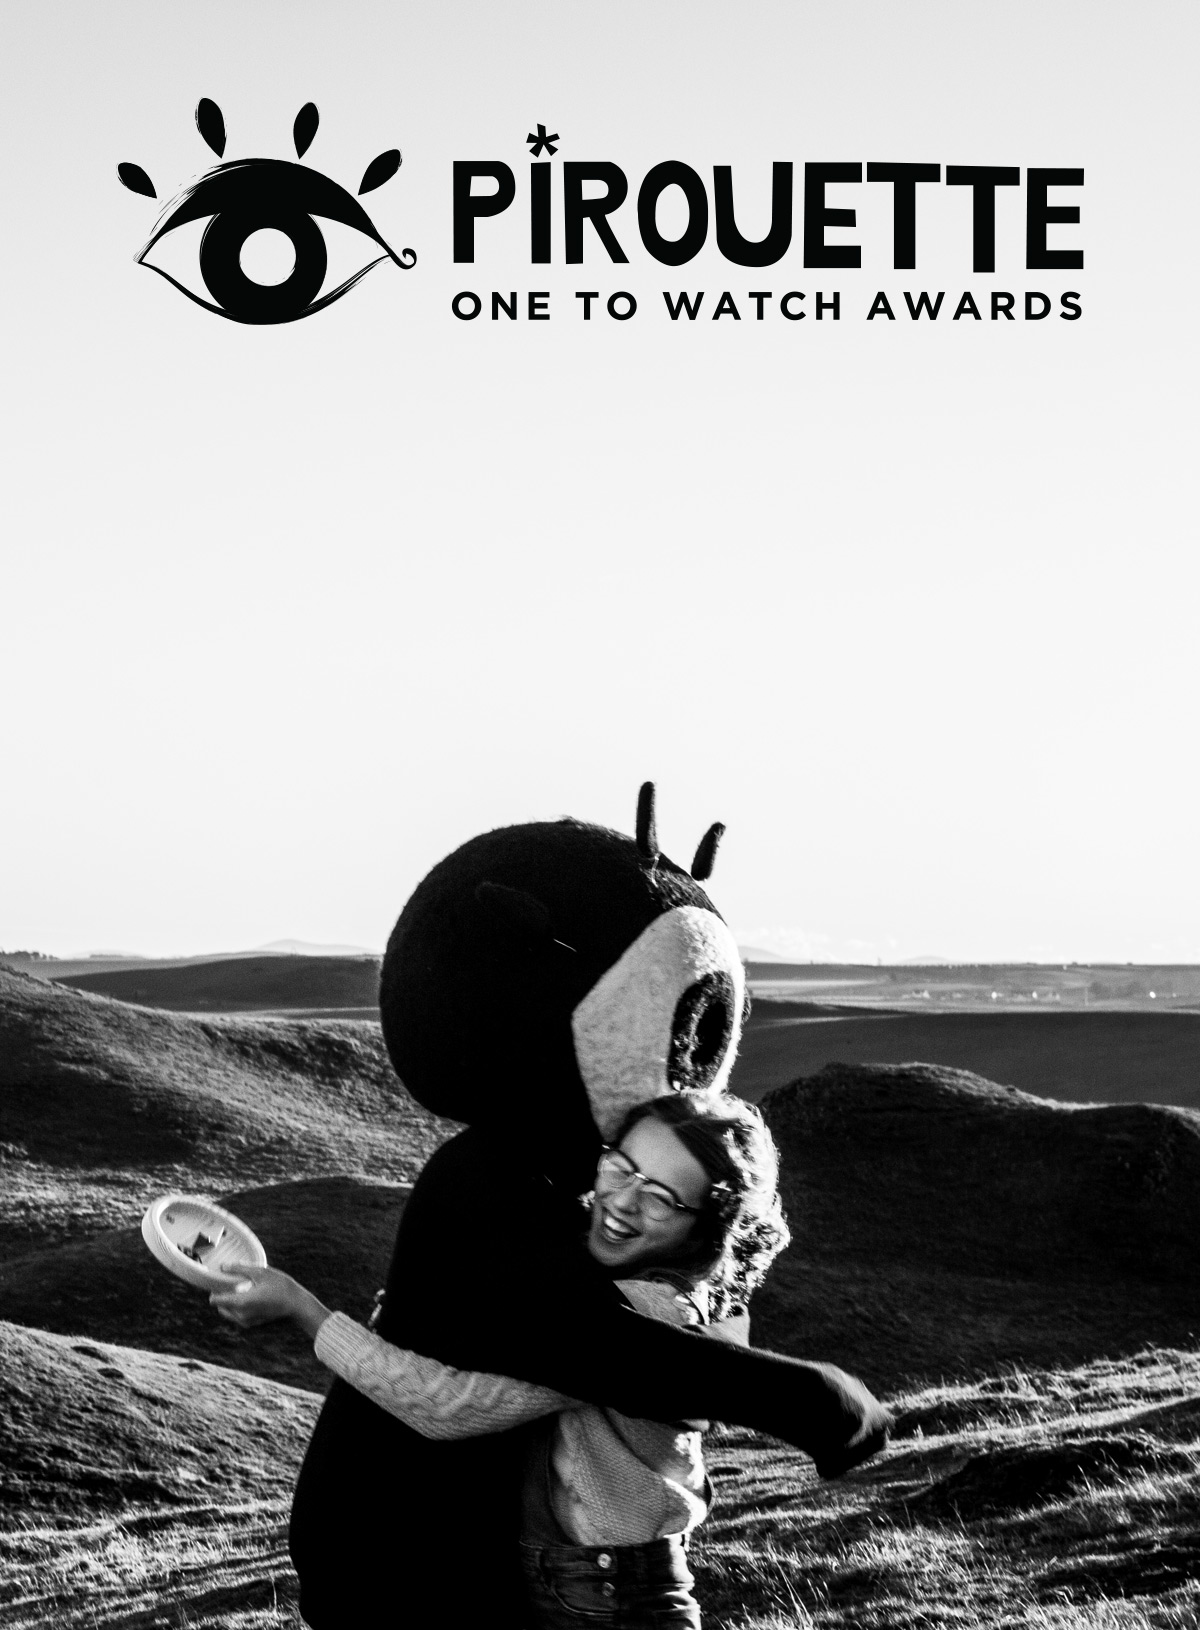 pirouette12watch-poster-c.jpg